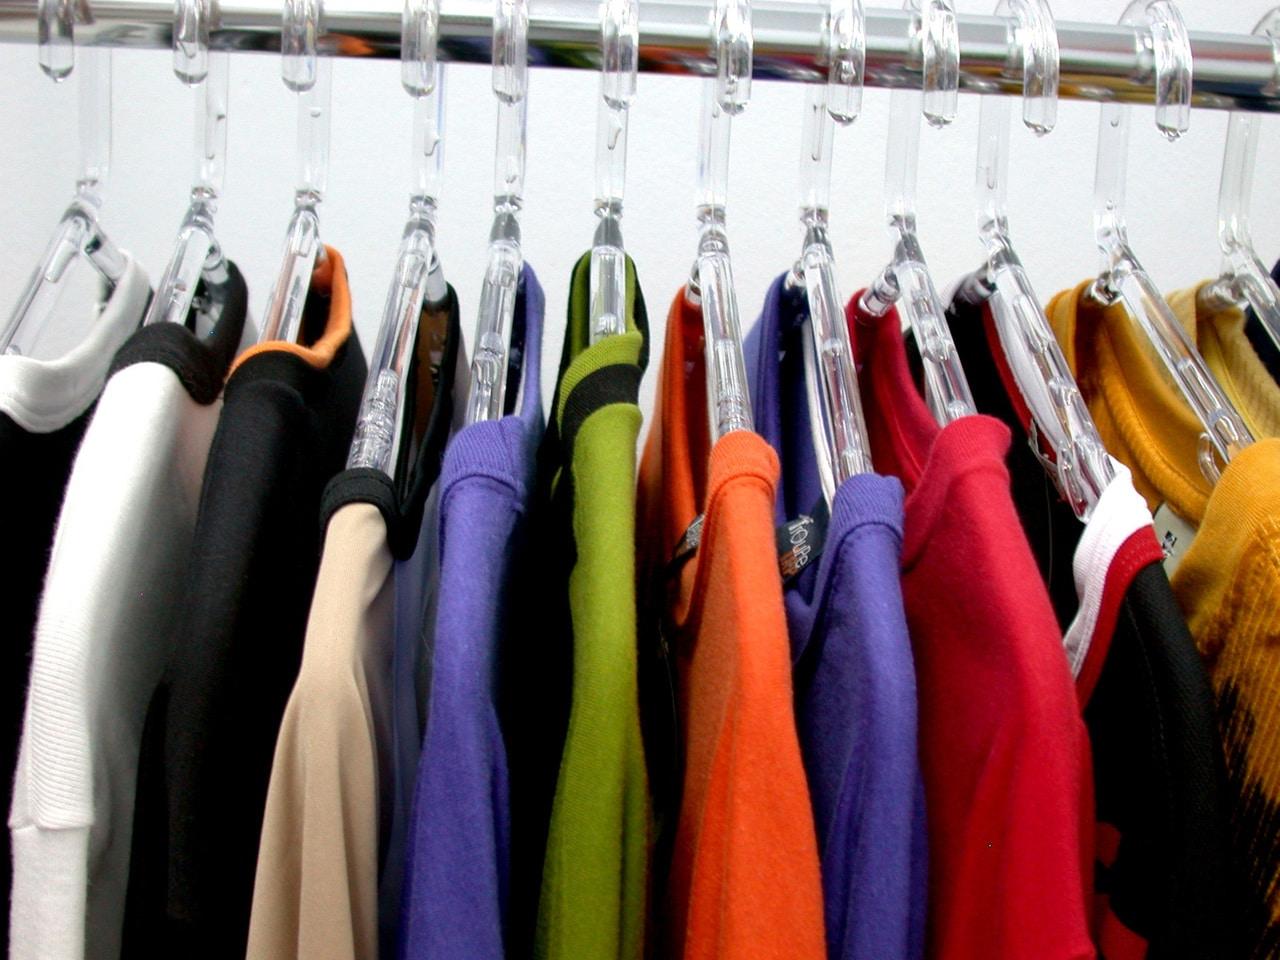 Kenali warna dan motif pakaian penjual atau pembeli